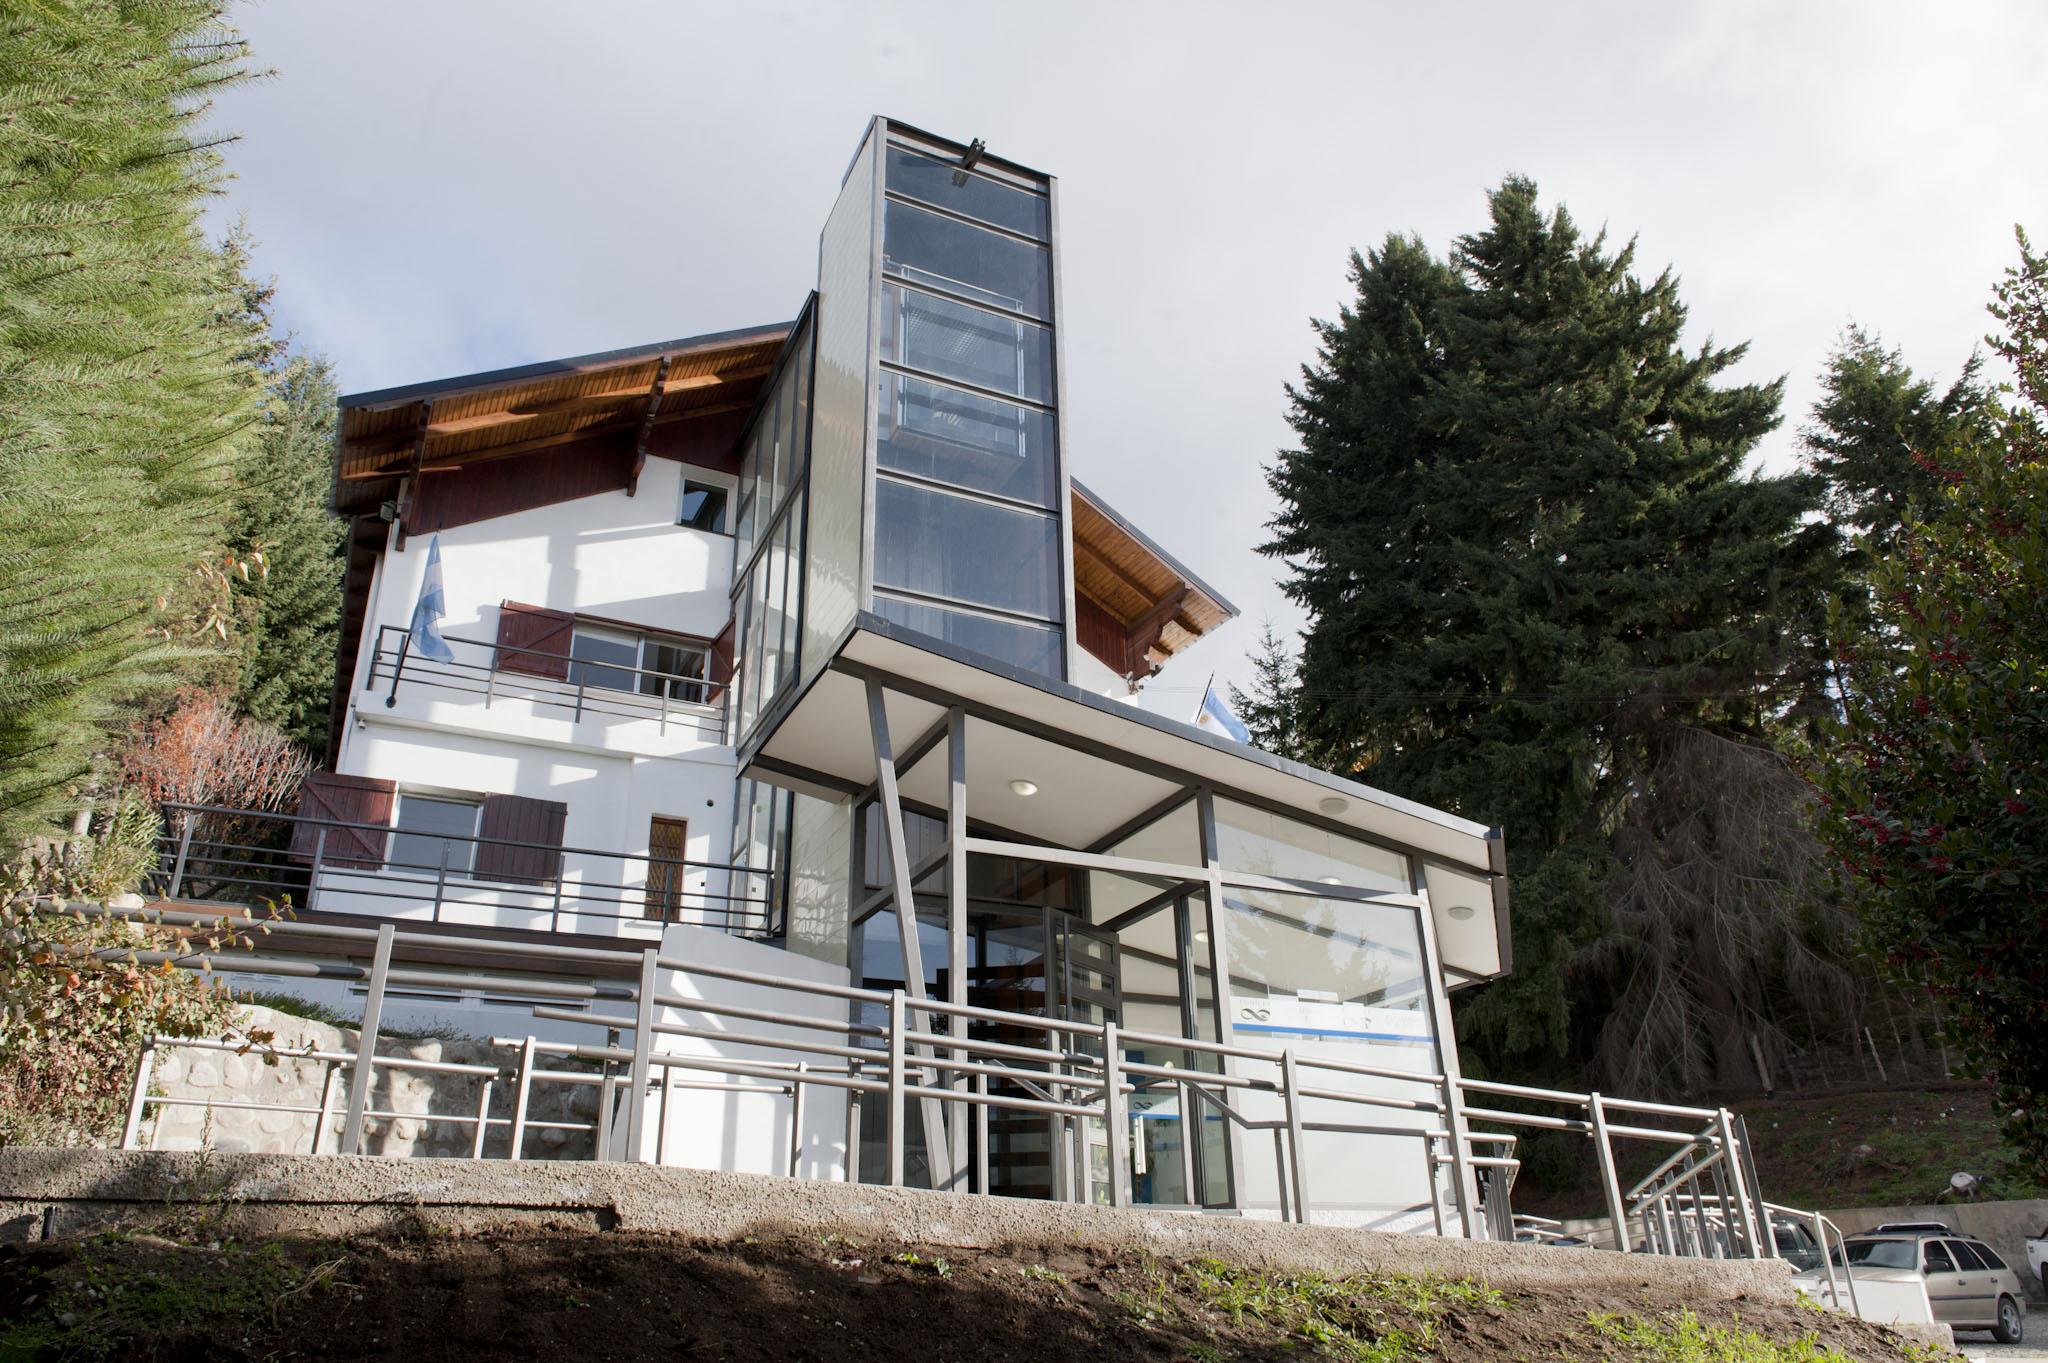 bariloche-inauguracion-del-centro-cientifico-tecnologico-conicet-patagonia-norte (1)